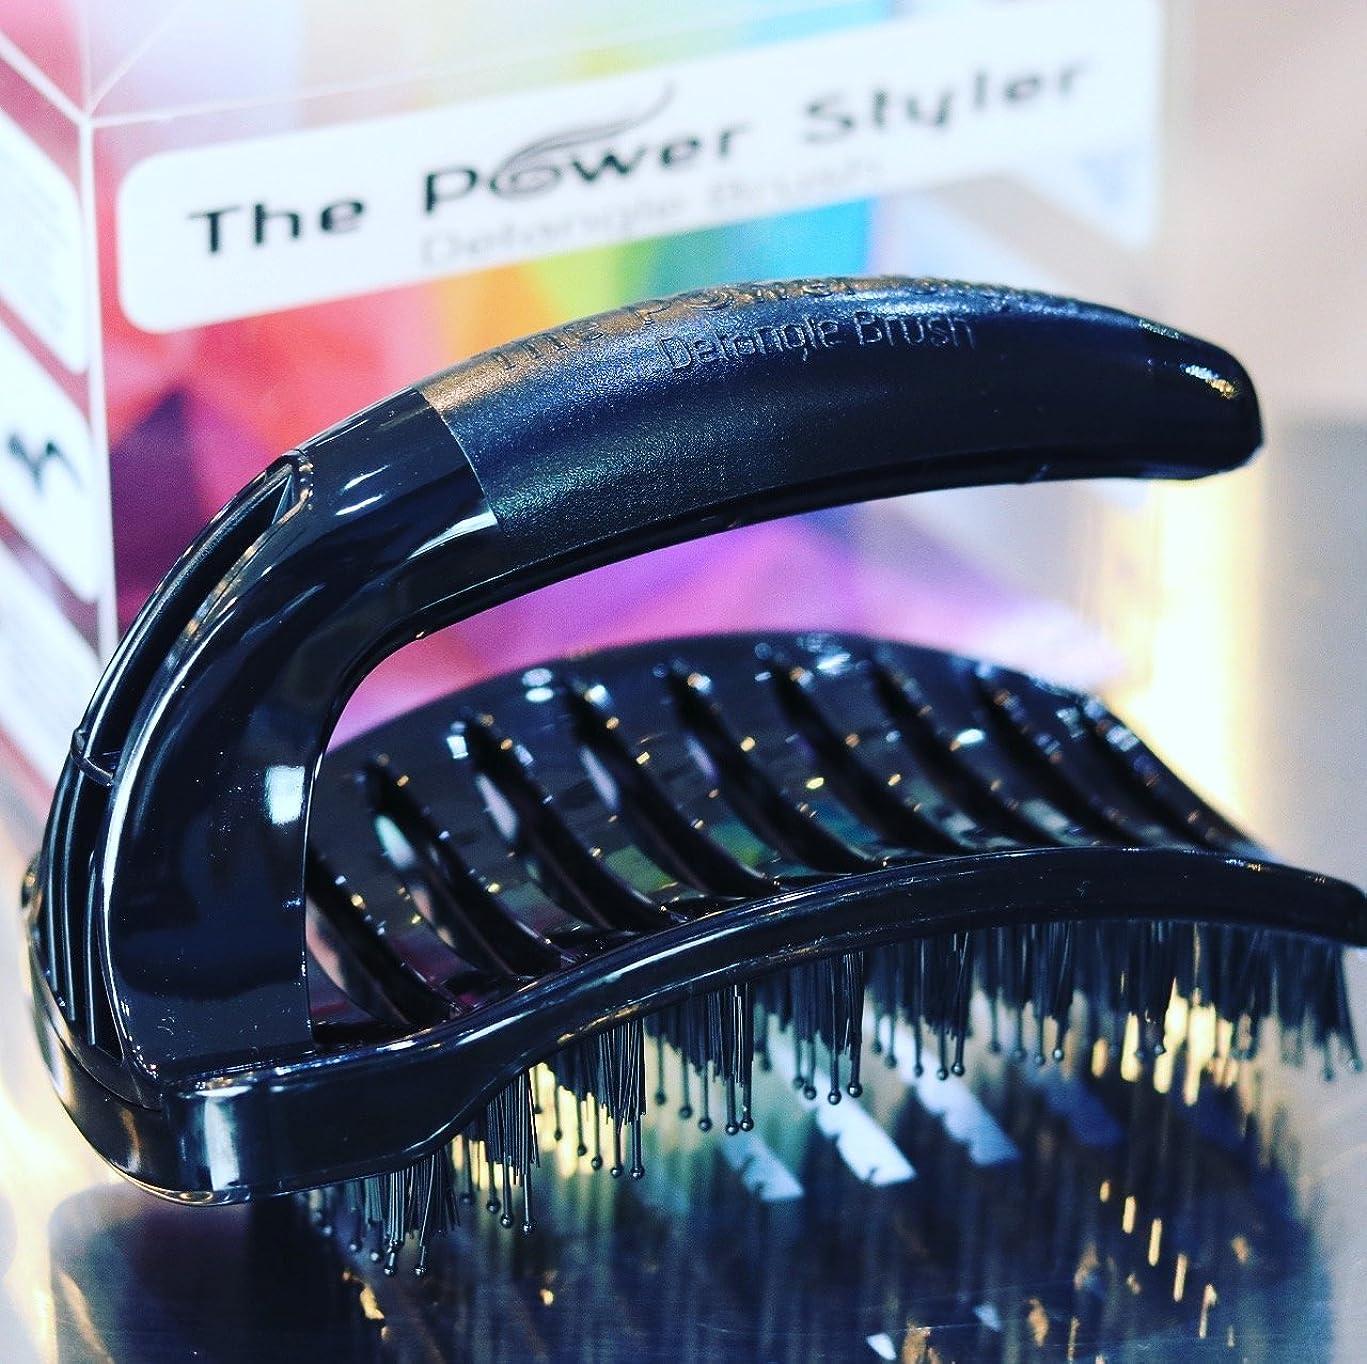 Detangle brush with unique multi positional handle for comfort. The #1 Best Detangling Hair Brush, for Wet/Dry hair, Scalp massaging hairbrush pain free detangling by The Power Styler